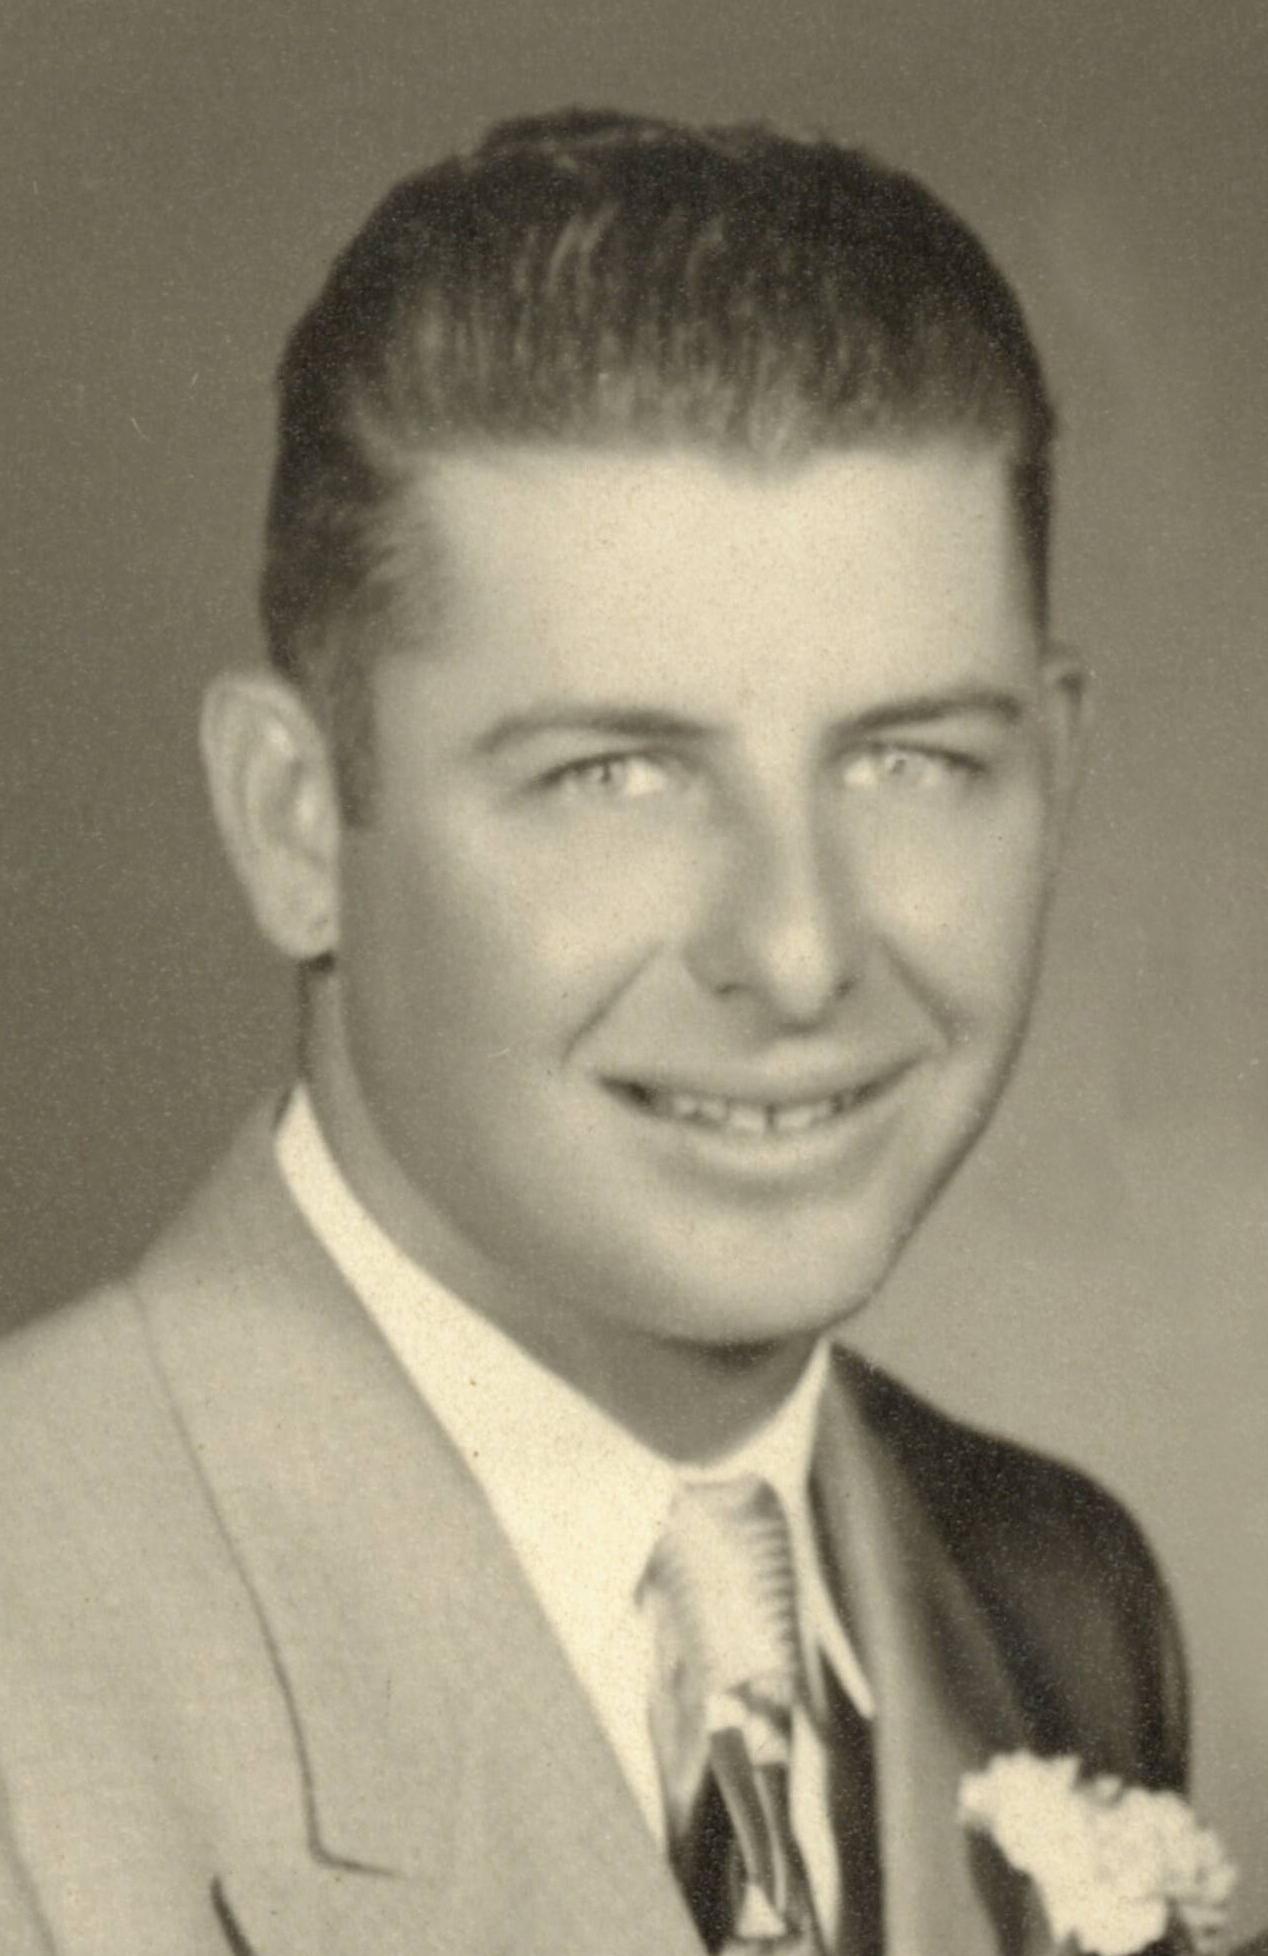 Dale Gene Skiles, 88 years of age, of Alma